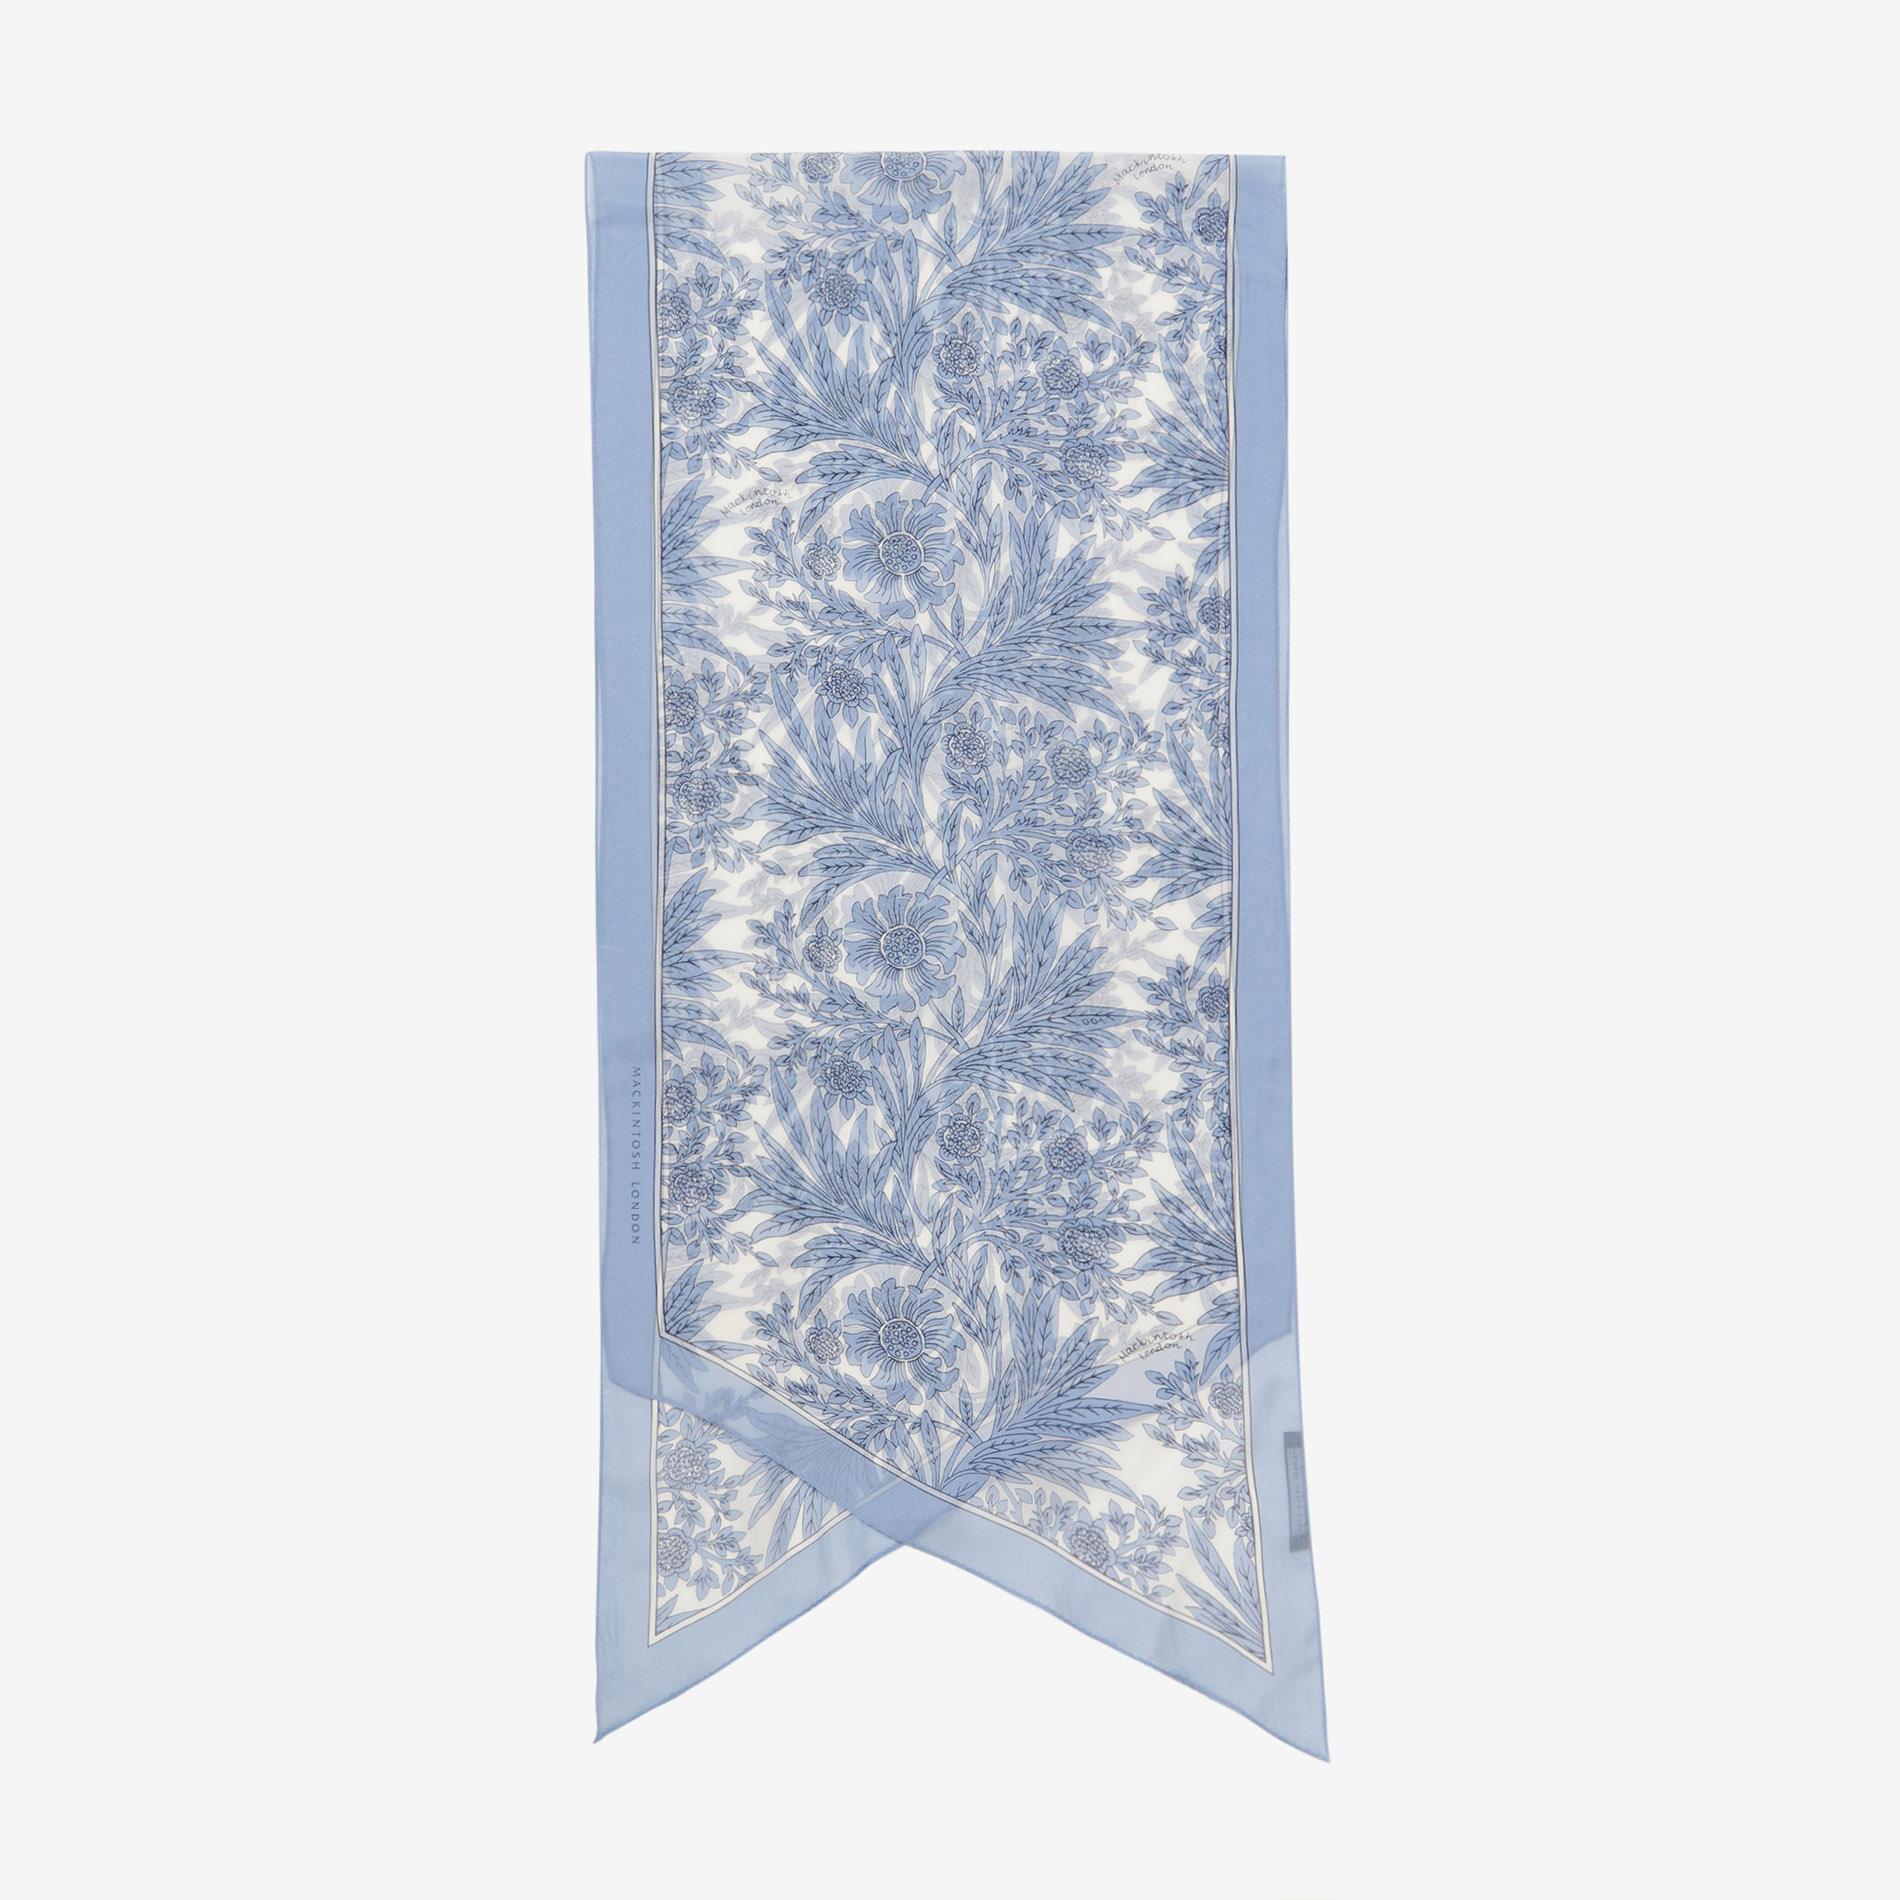 【BIBURY FLOWER】剣先スカーフ